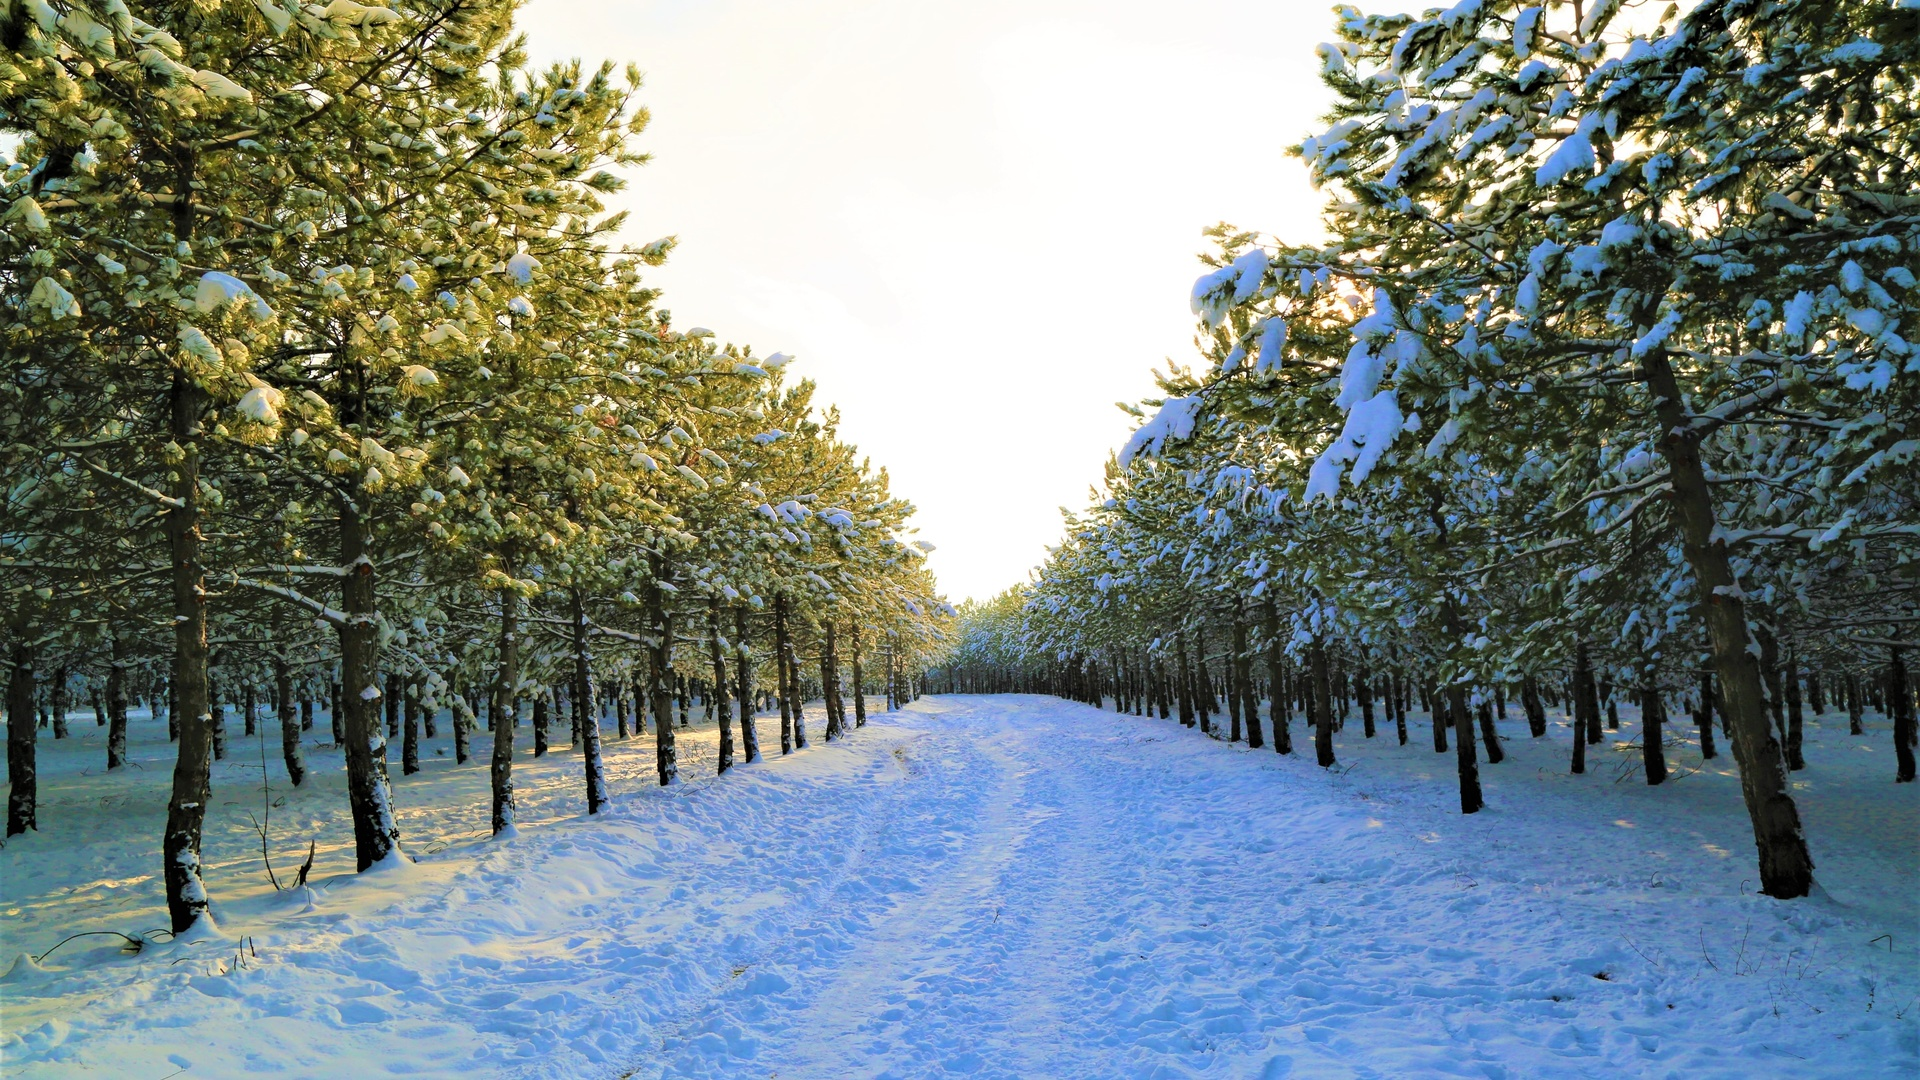 аллея, деревья, снег, зима